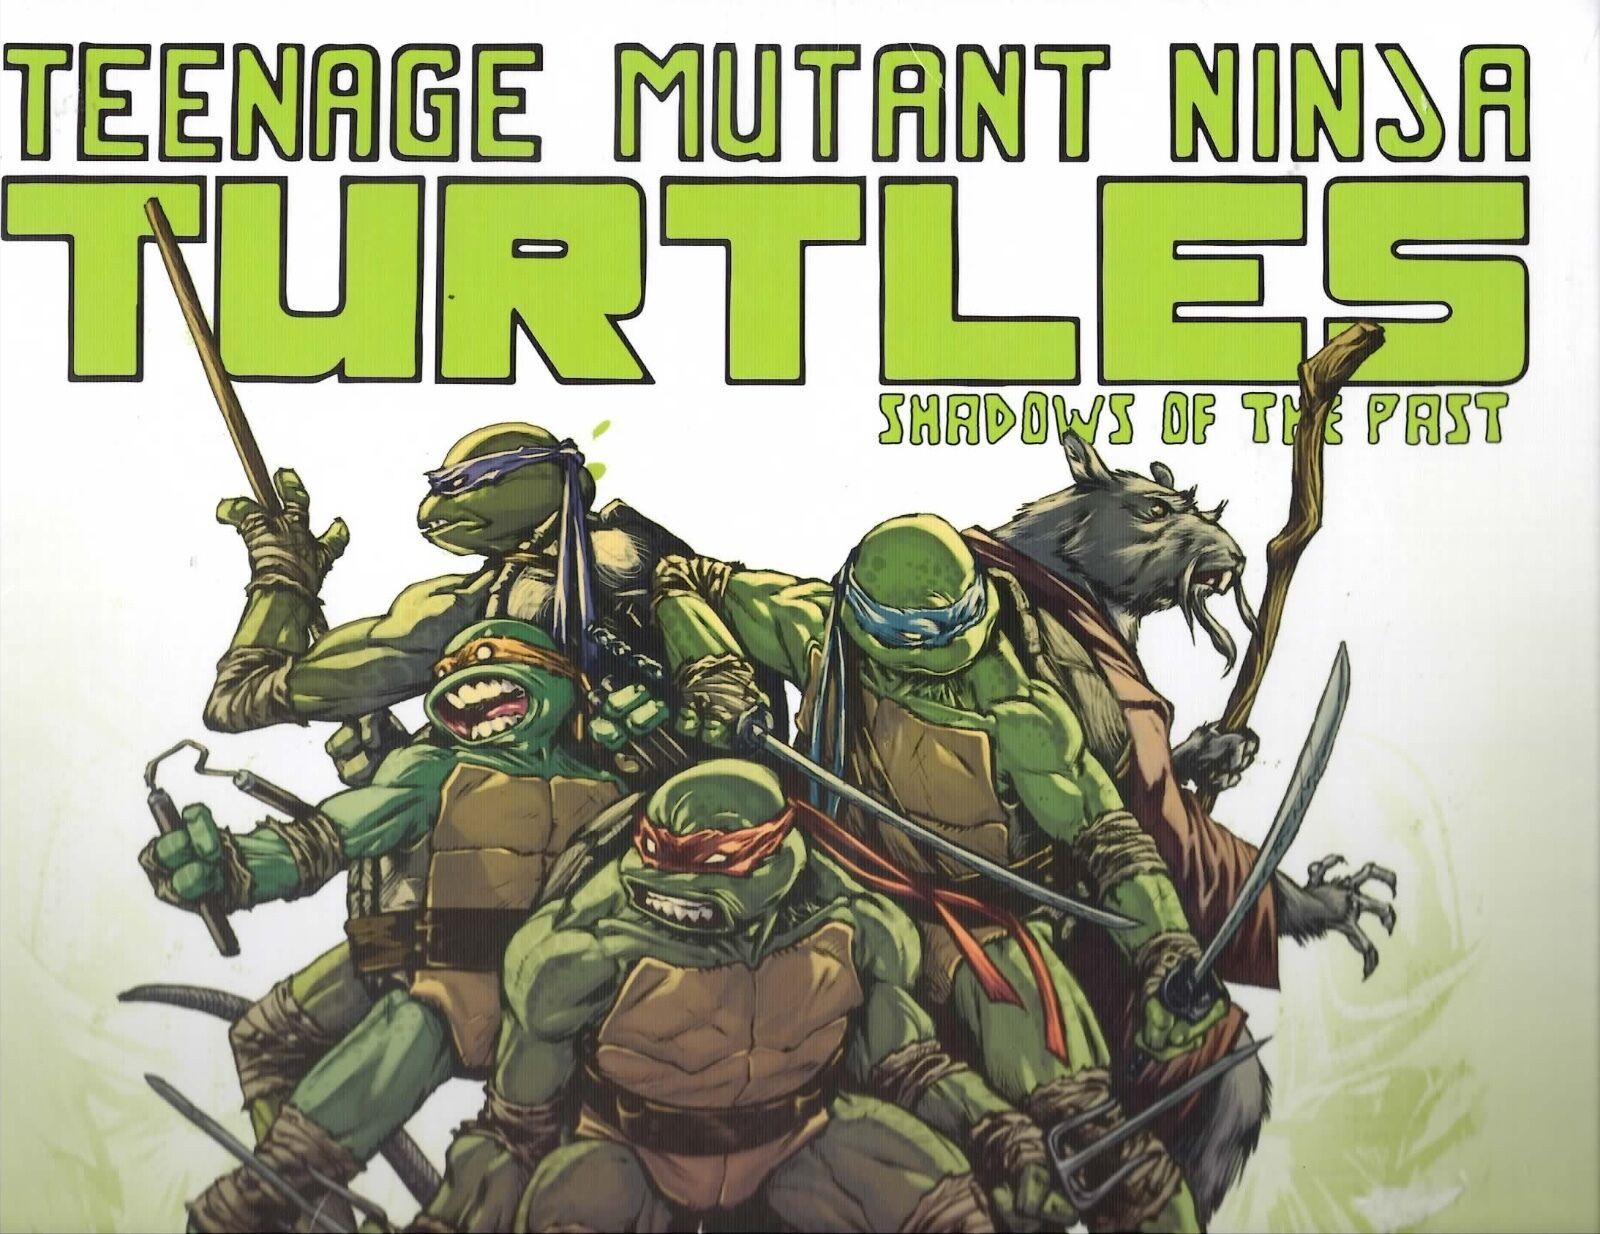 IDW GAMES Teenage Mutant Ninja Turtles Shadows of the Past boardgames New